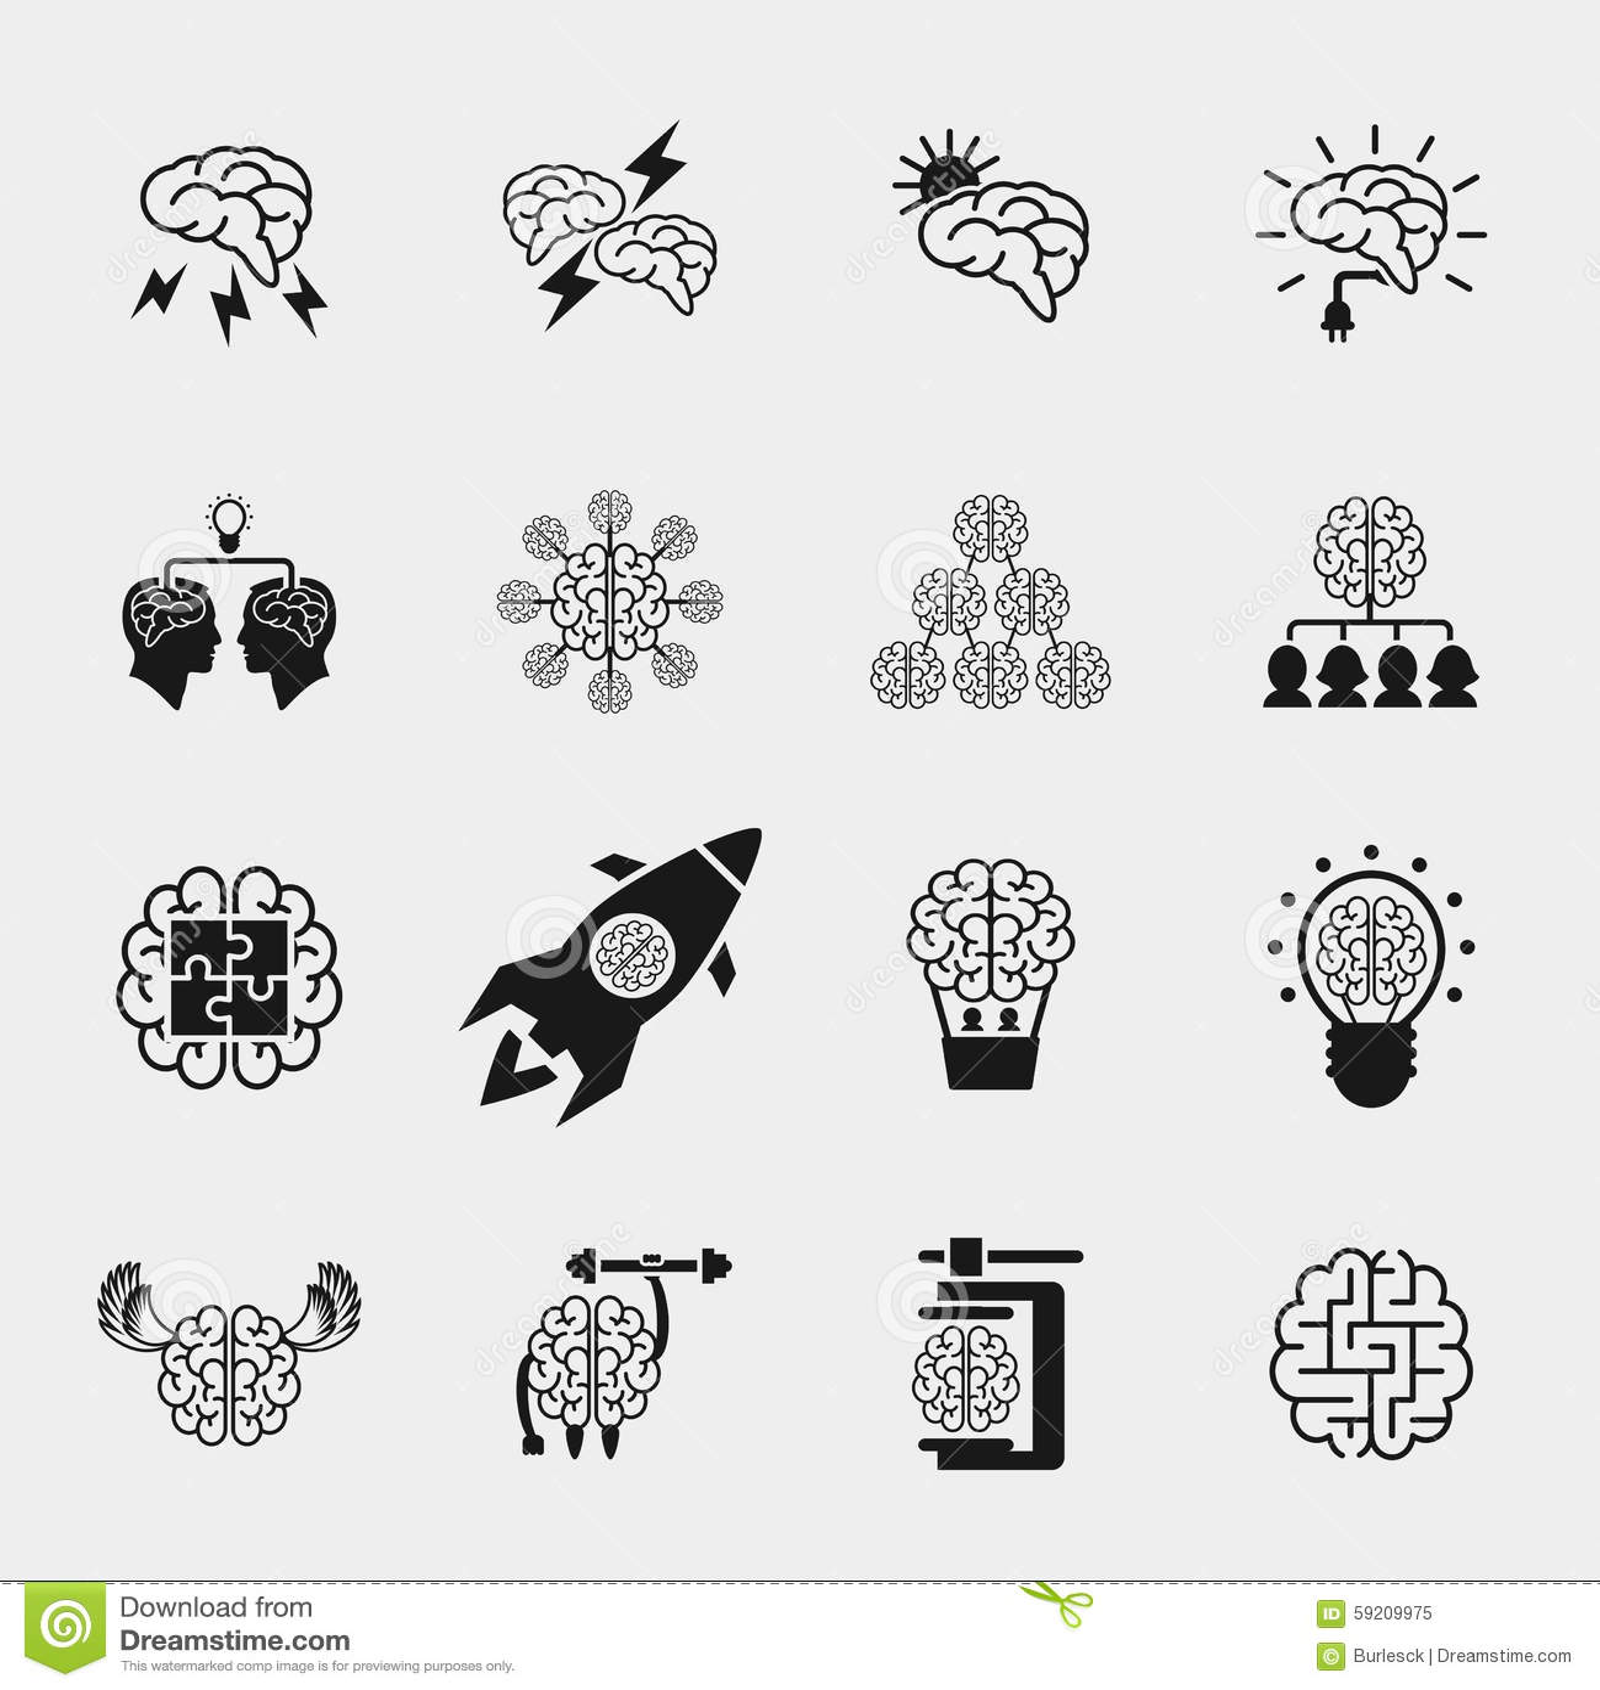 Human Head, Creative Idea Icons Set Cartoon Vector